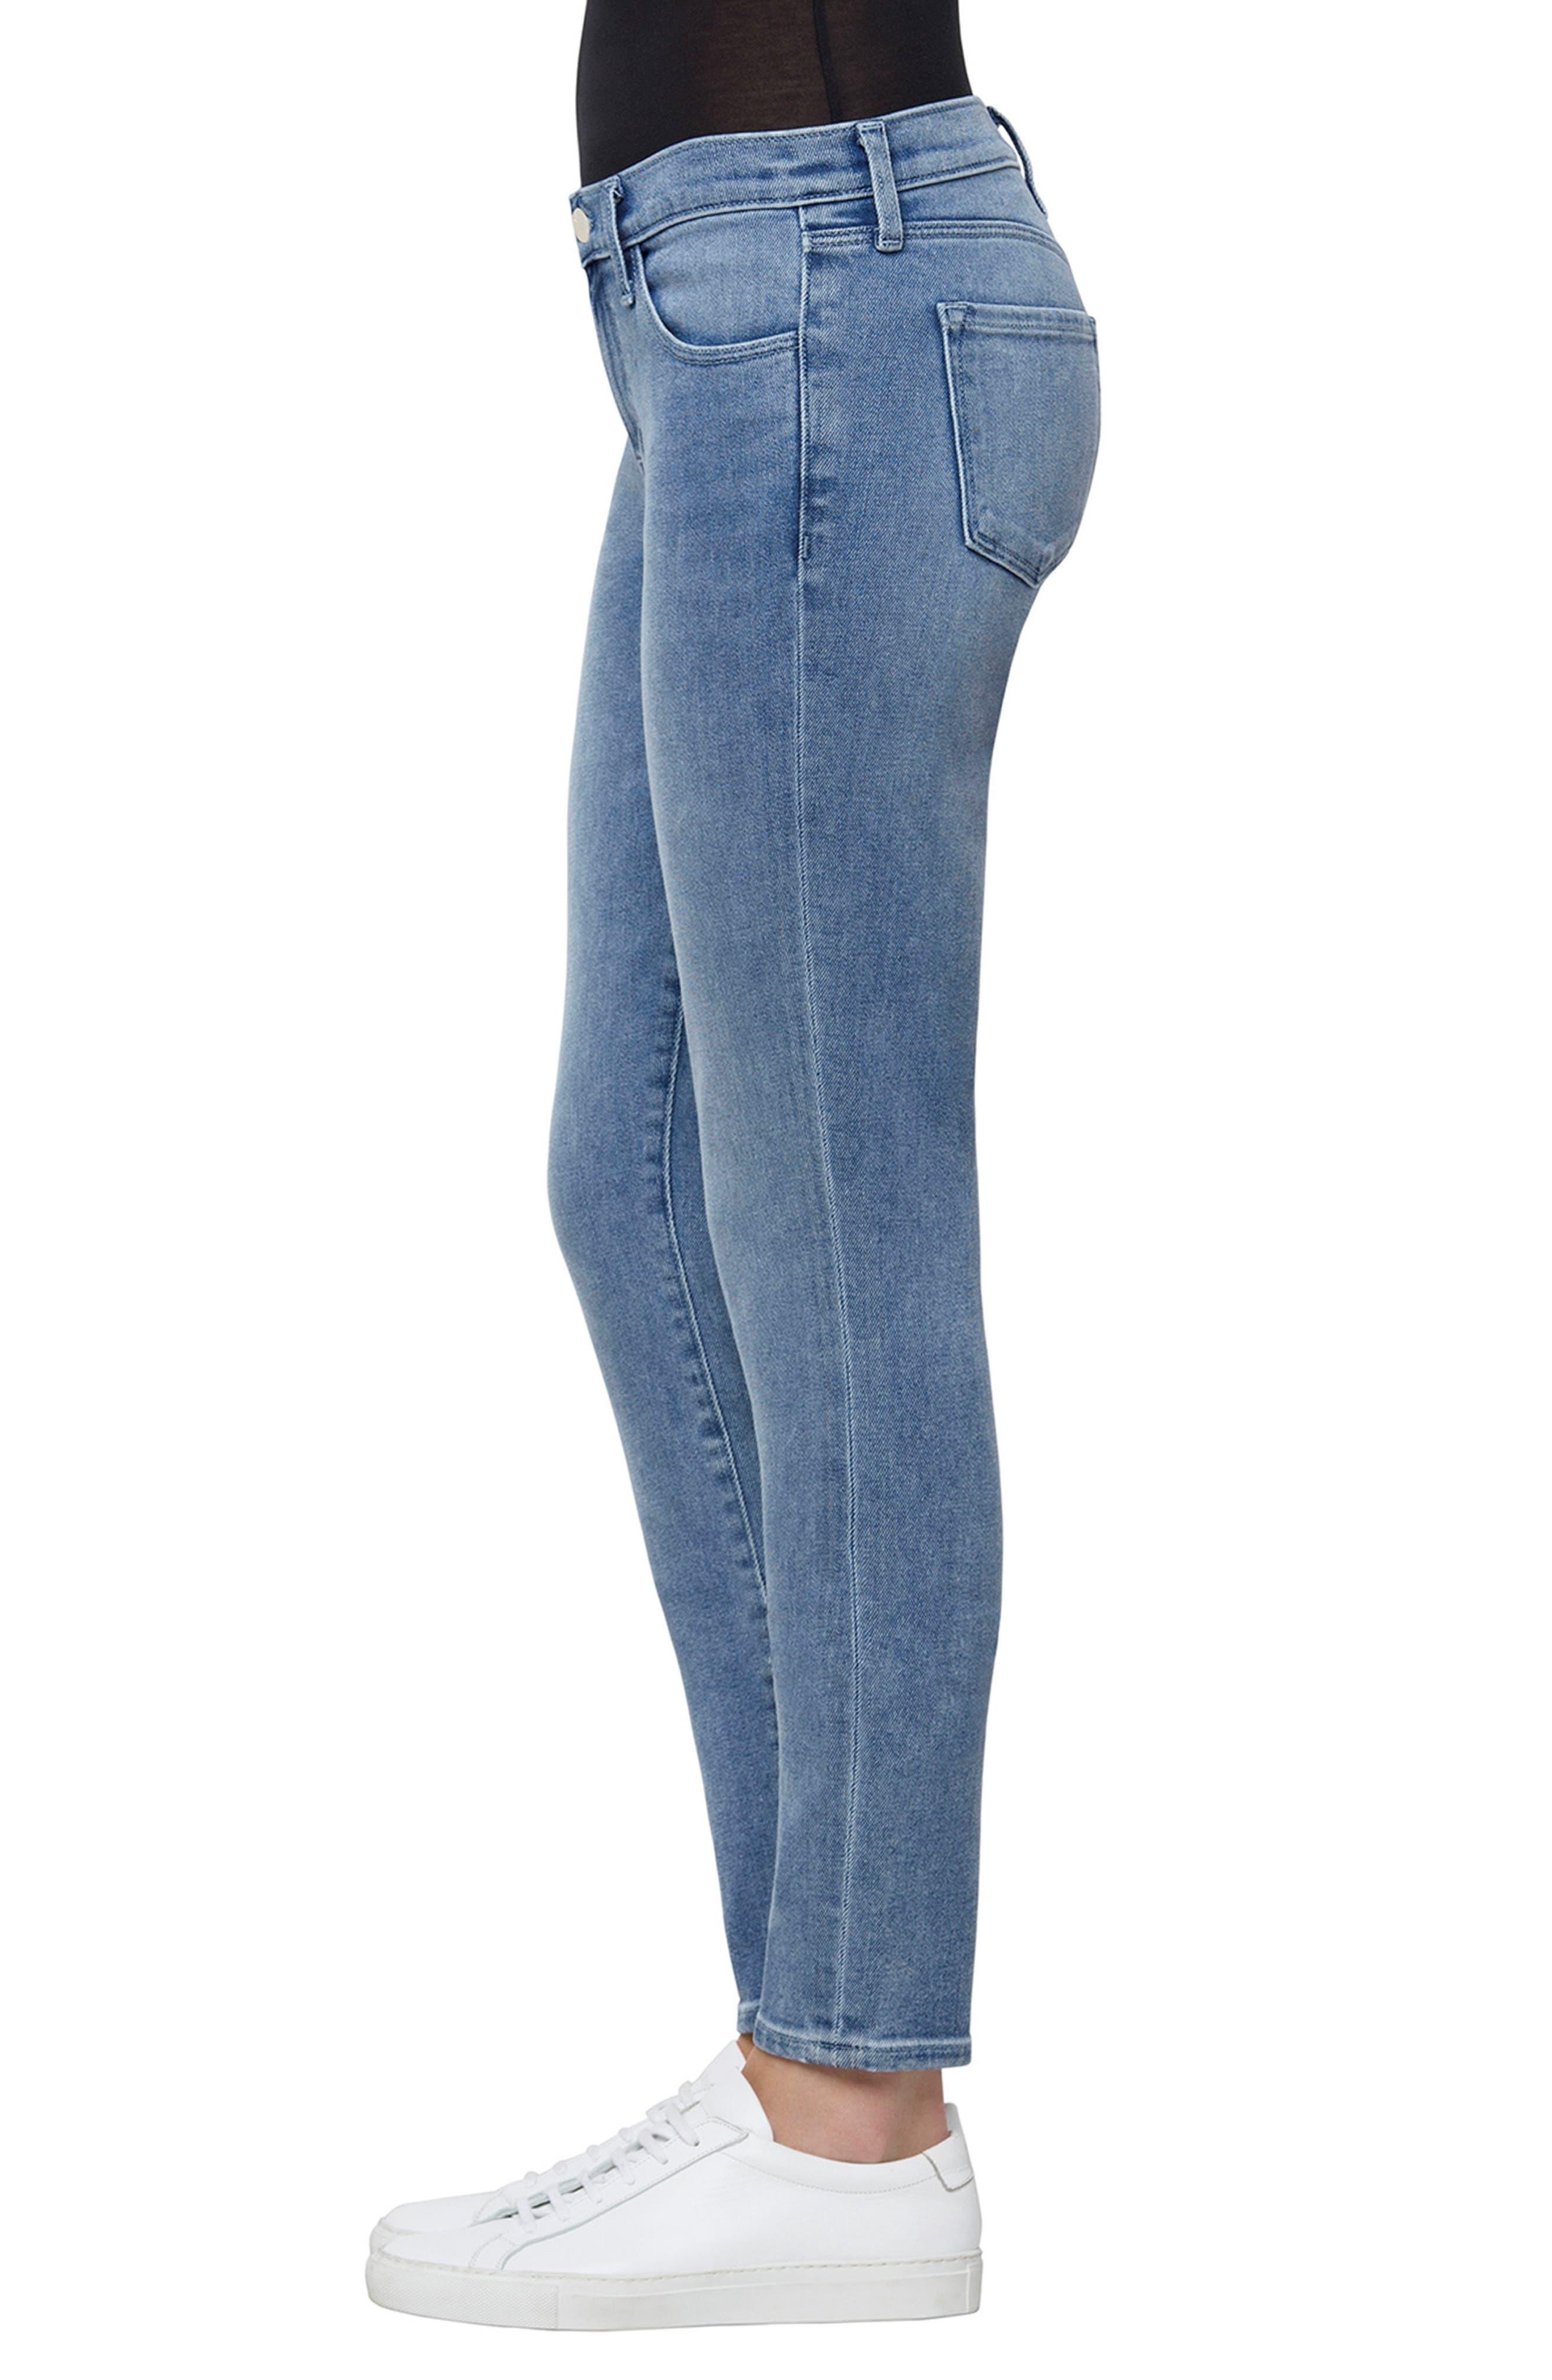 811 Skinny Jeans,                             Alternate thumbnail 3, color,                             Utopia